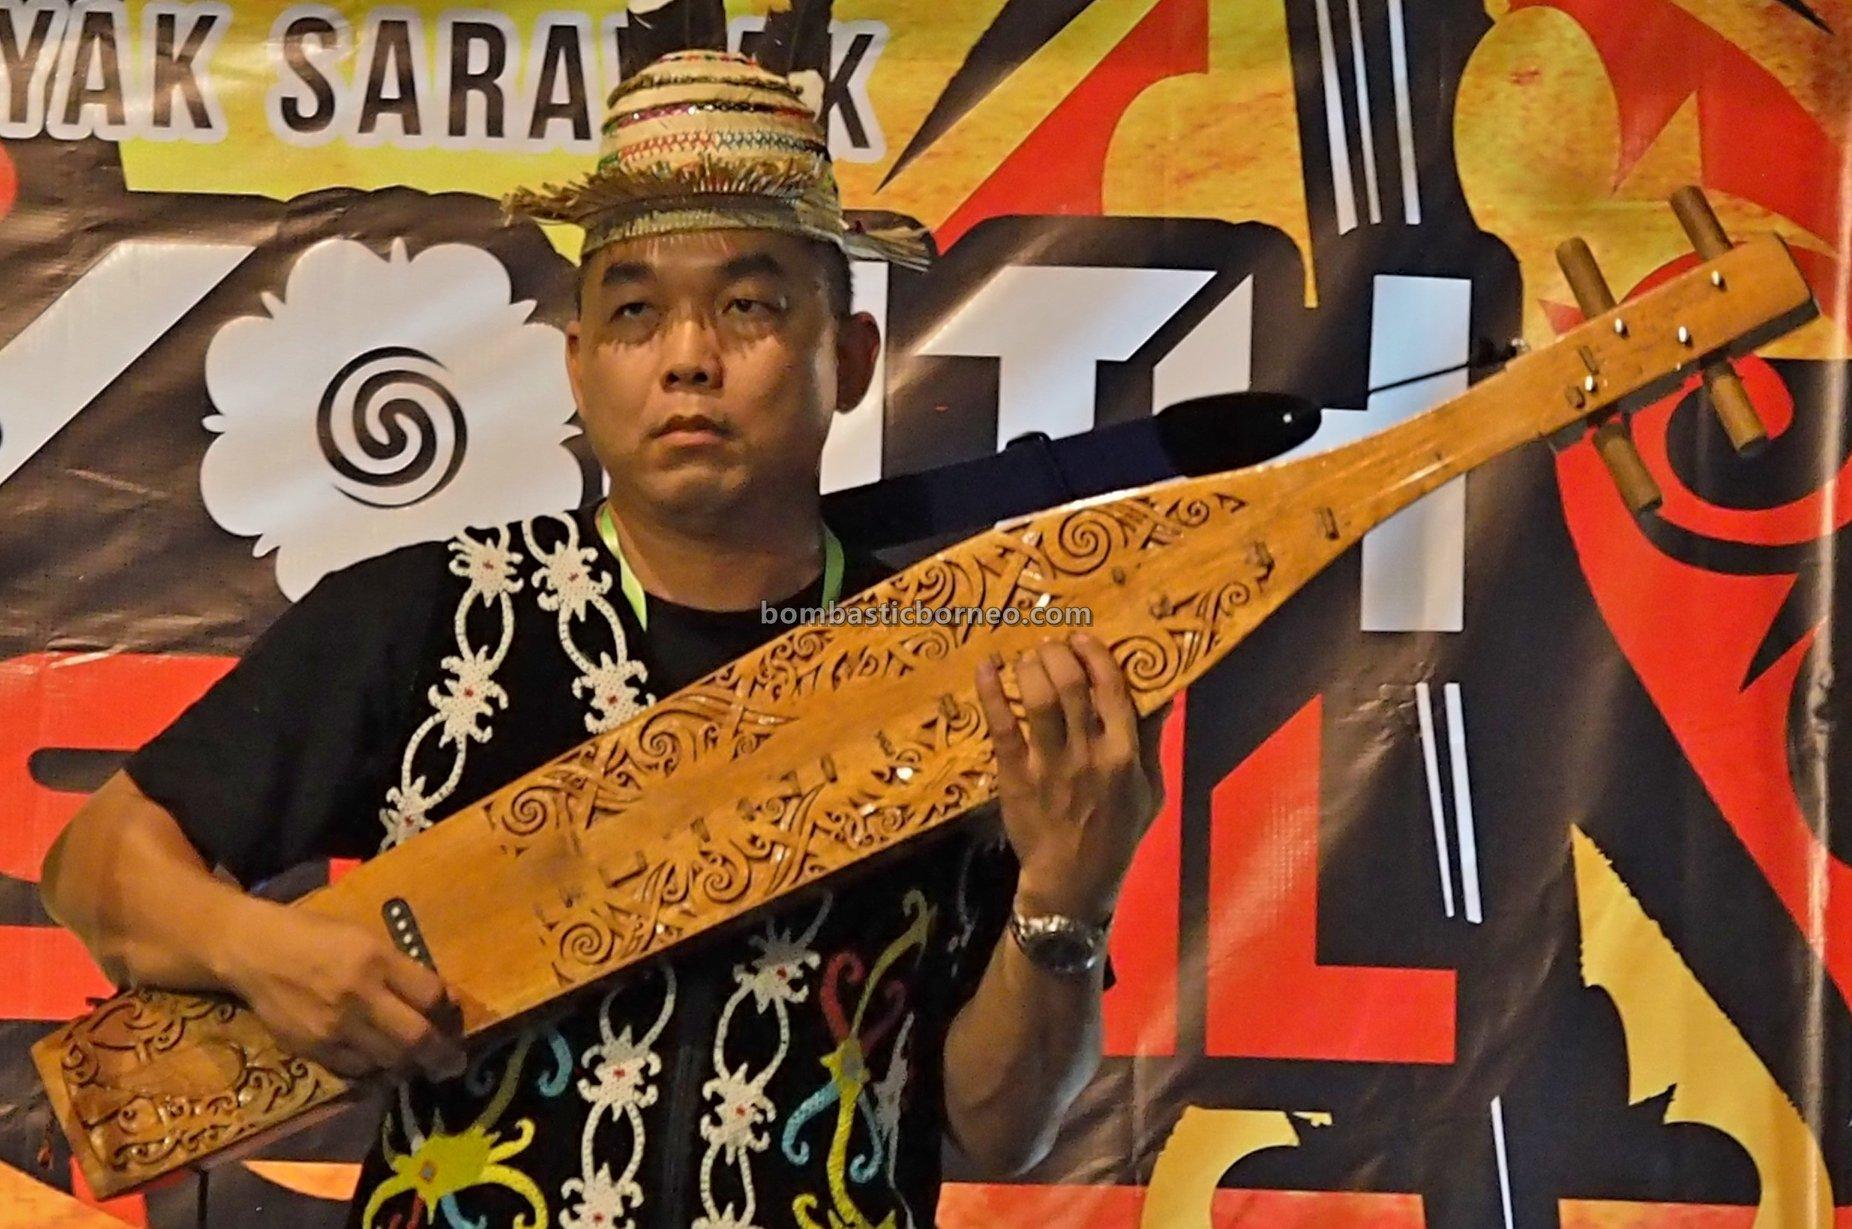 Youth Sape Festival, authentic, traditional, Ethnic, native, tribal, orang ulu, Sibu, Malaysia, Tourism, travel guide, guitar, 婆罗洲肯雅族沙贝, 砂拉越原住民吉他, 马来西亚达雅音乐